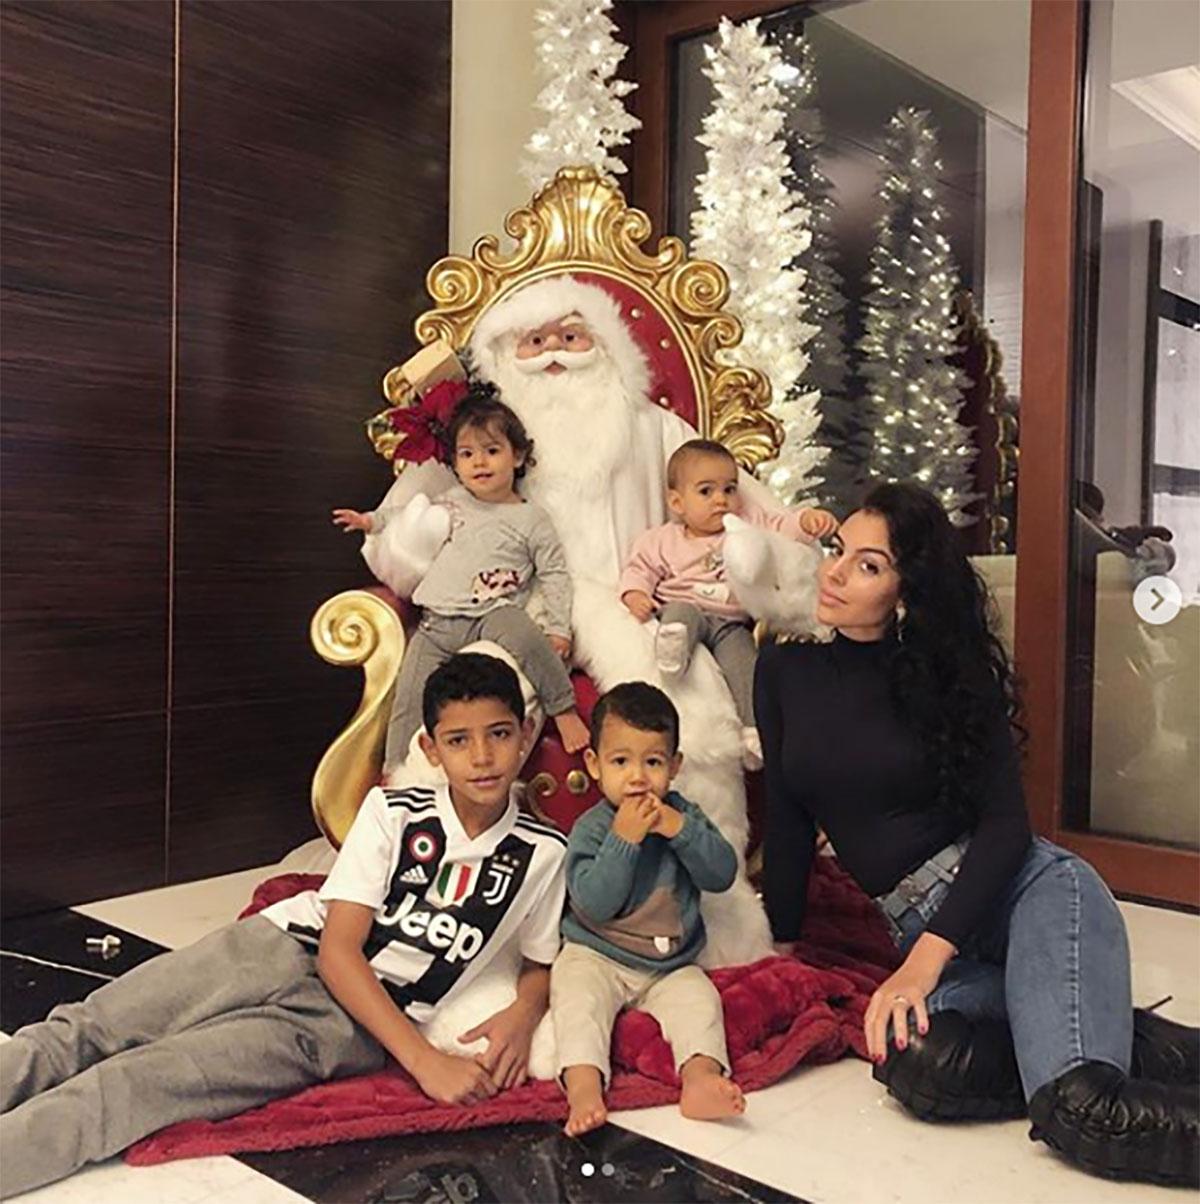 novia-cristiano-ronaldo-hijos-navidad.jpg